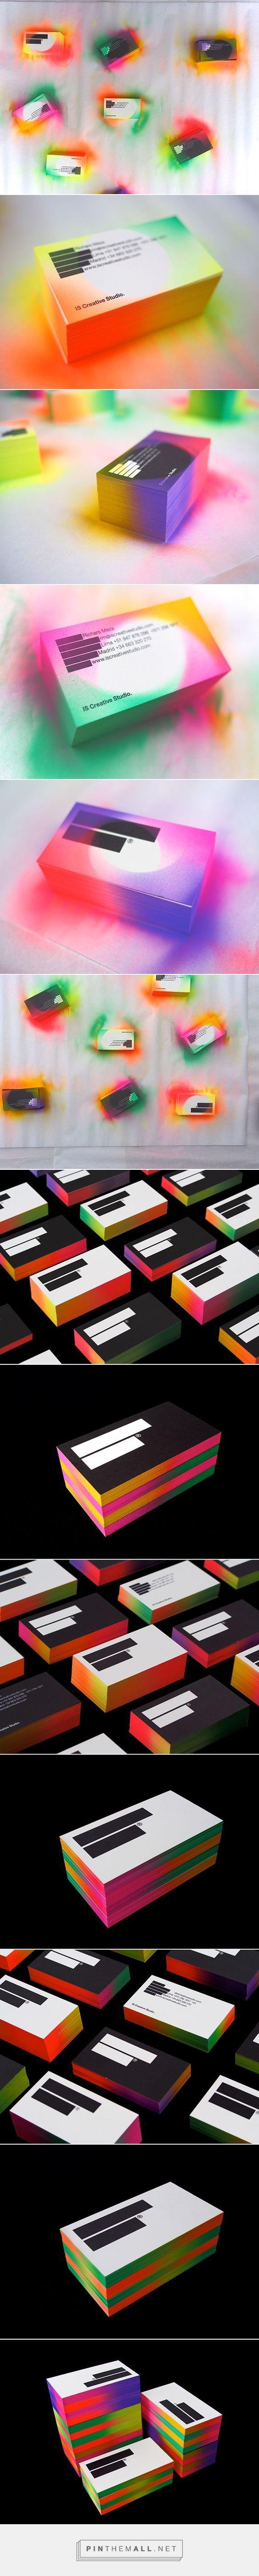 15 best creative business card design los angeles images on pinterest